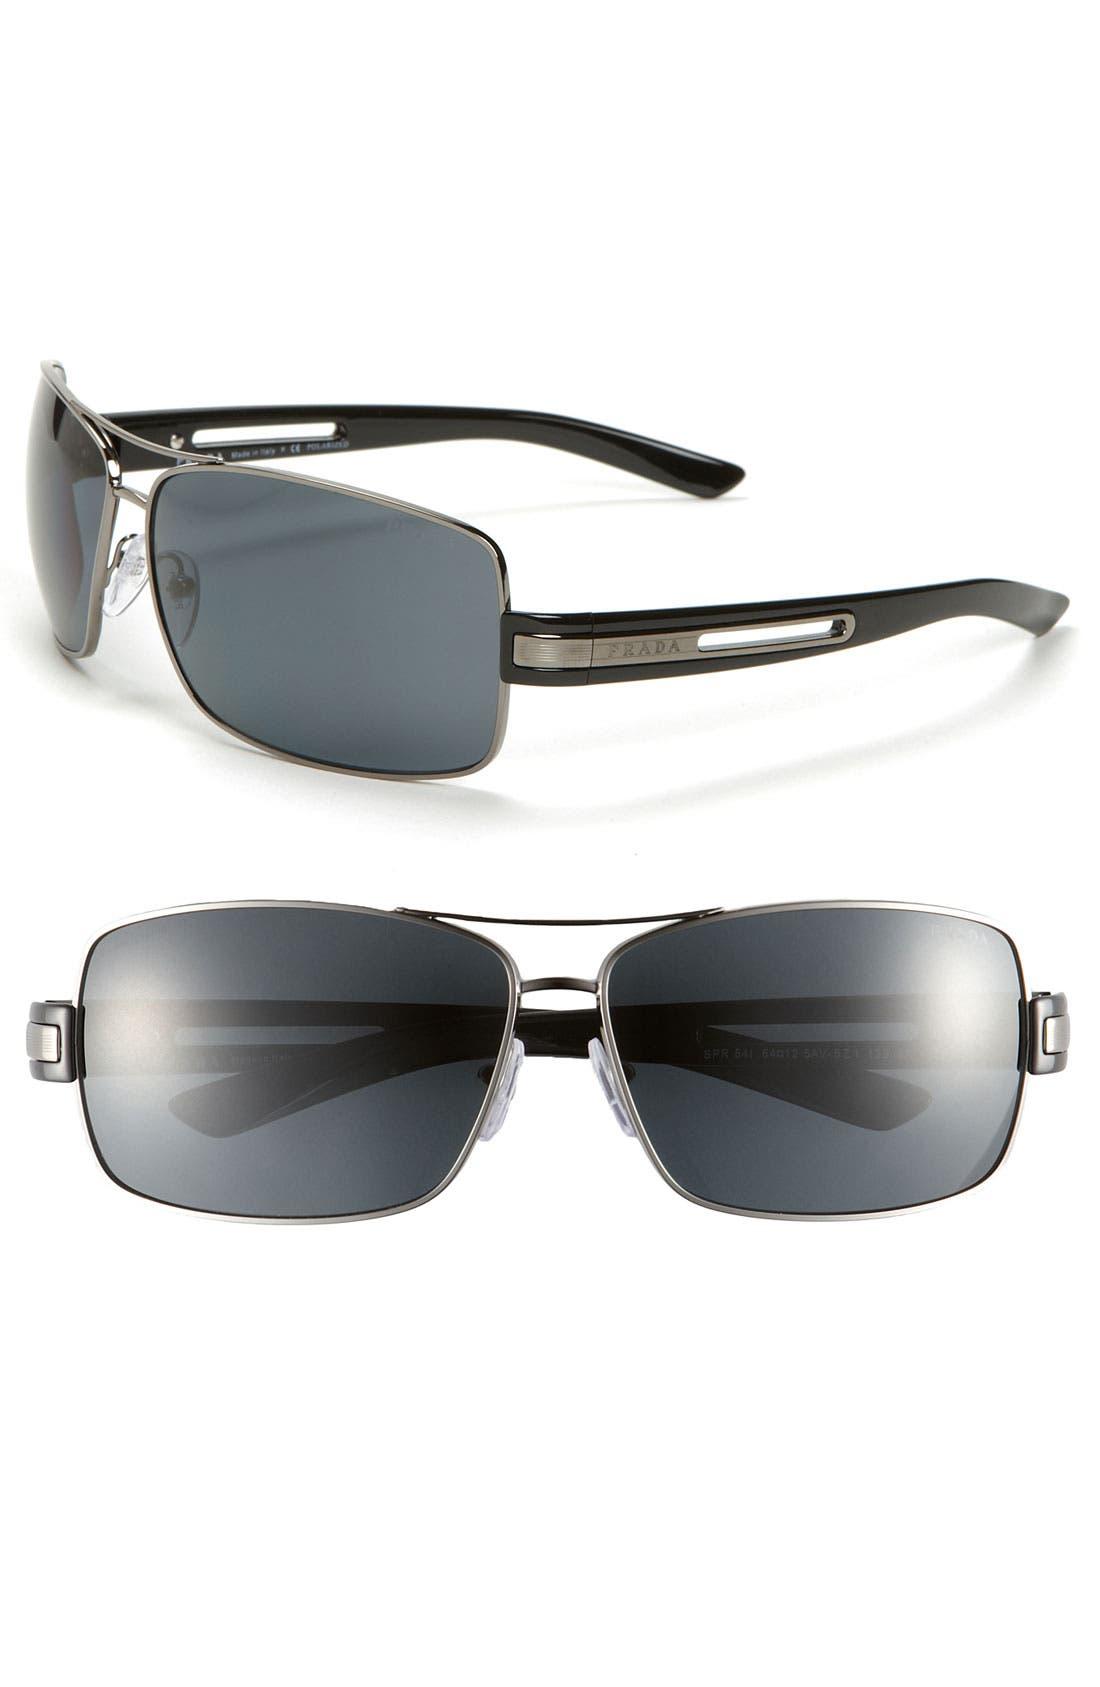 Alternate Image 1 Selected - Prada Polarized Aviator Sunglasses